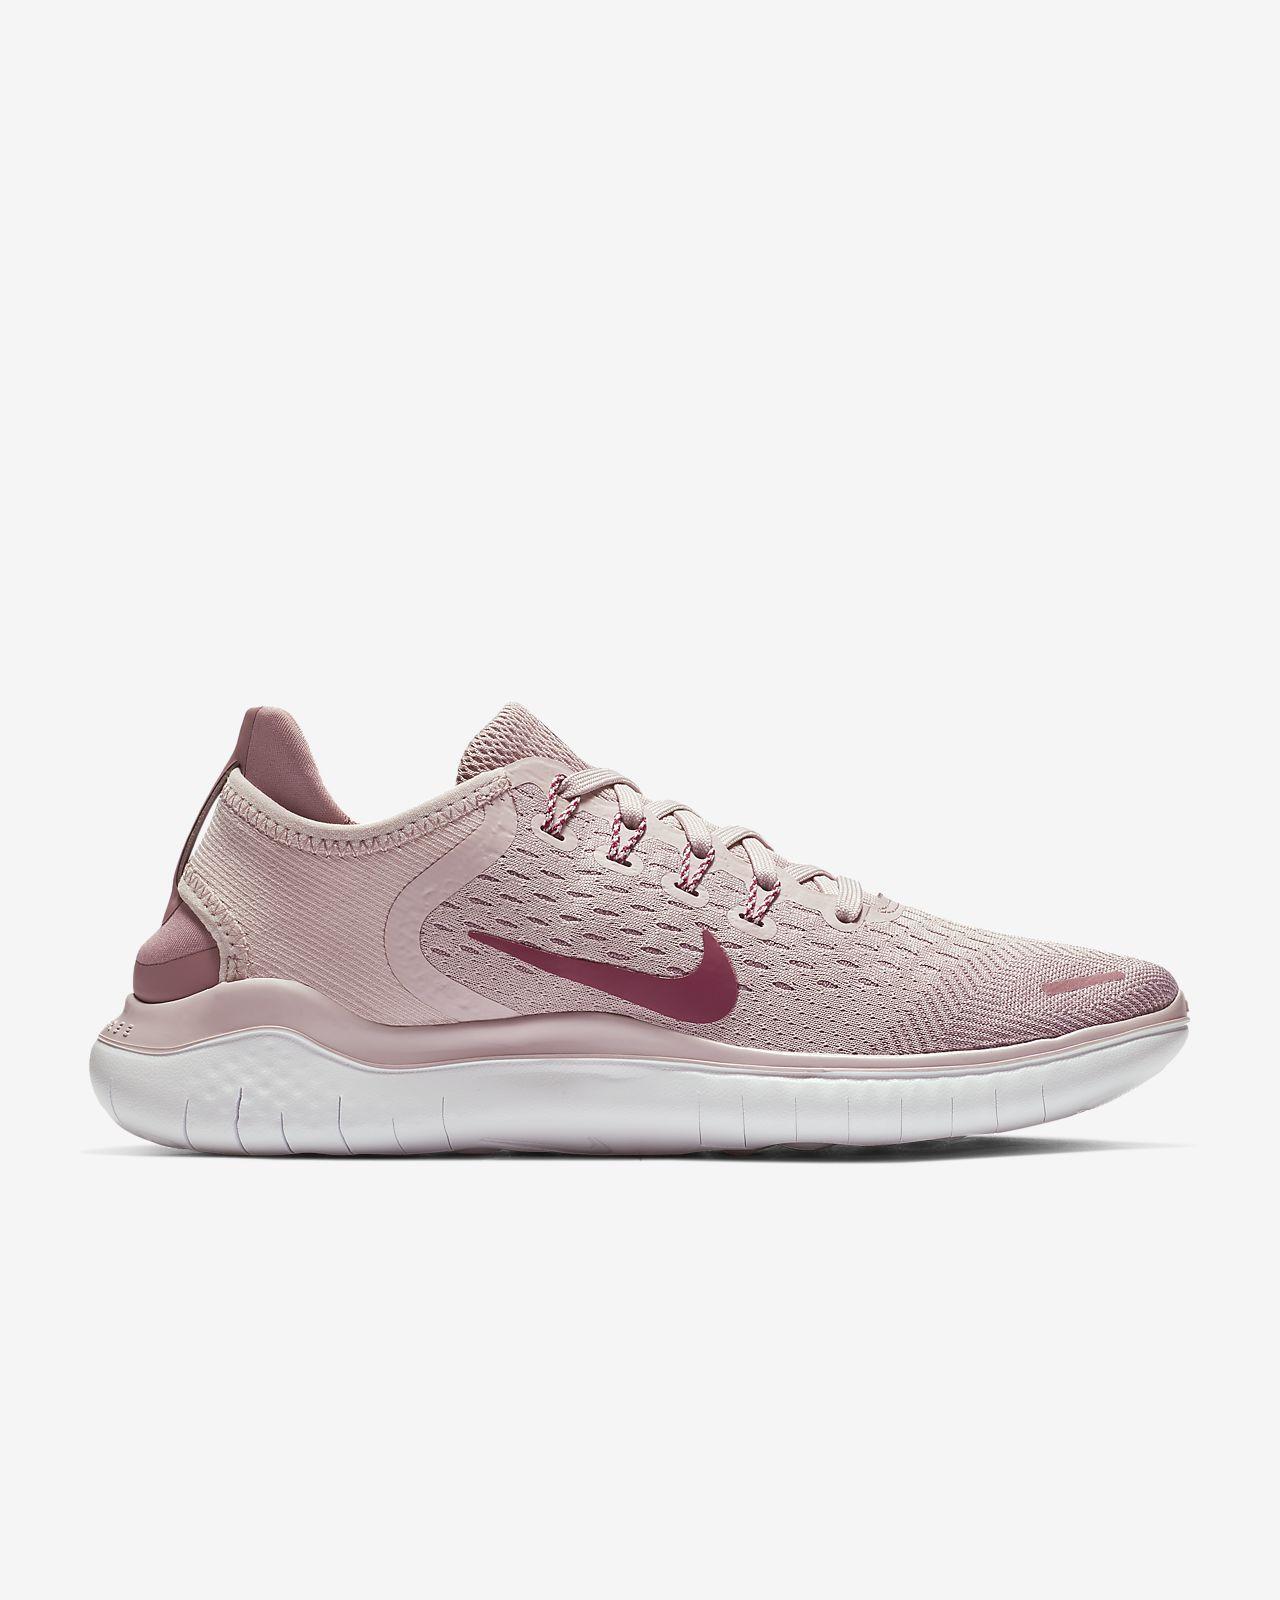 83451cd055 Nike Free RN 2018 Women's Running Shoe